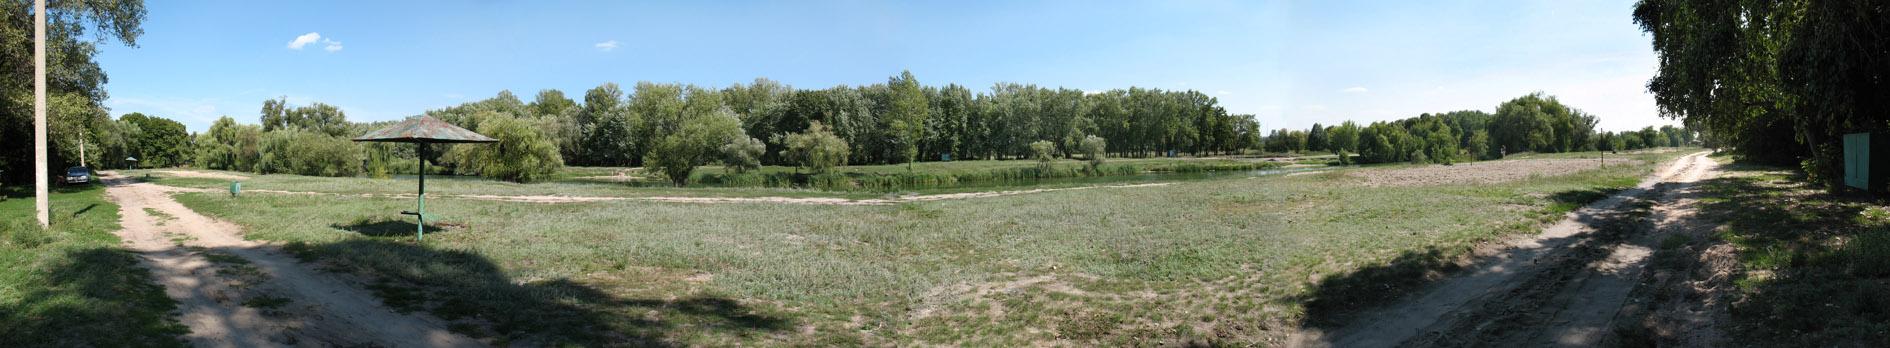 панорама Журавлевский гидропарк_